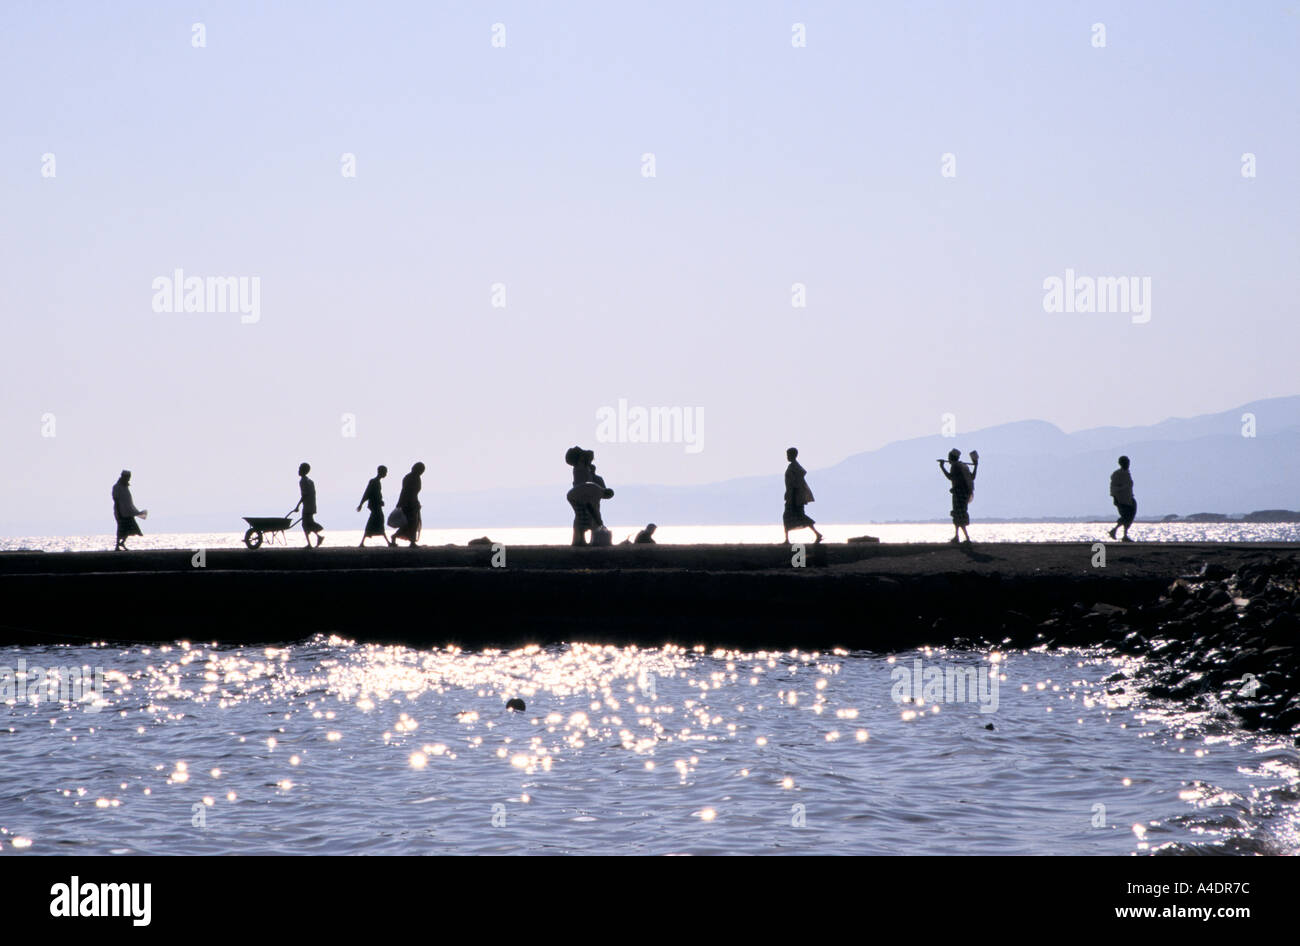 Waterfront, Tadjoura Djibouti - Stock Image